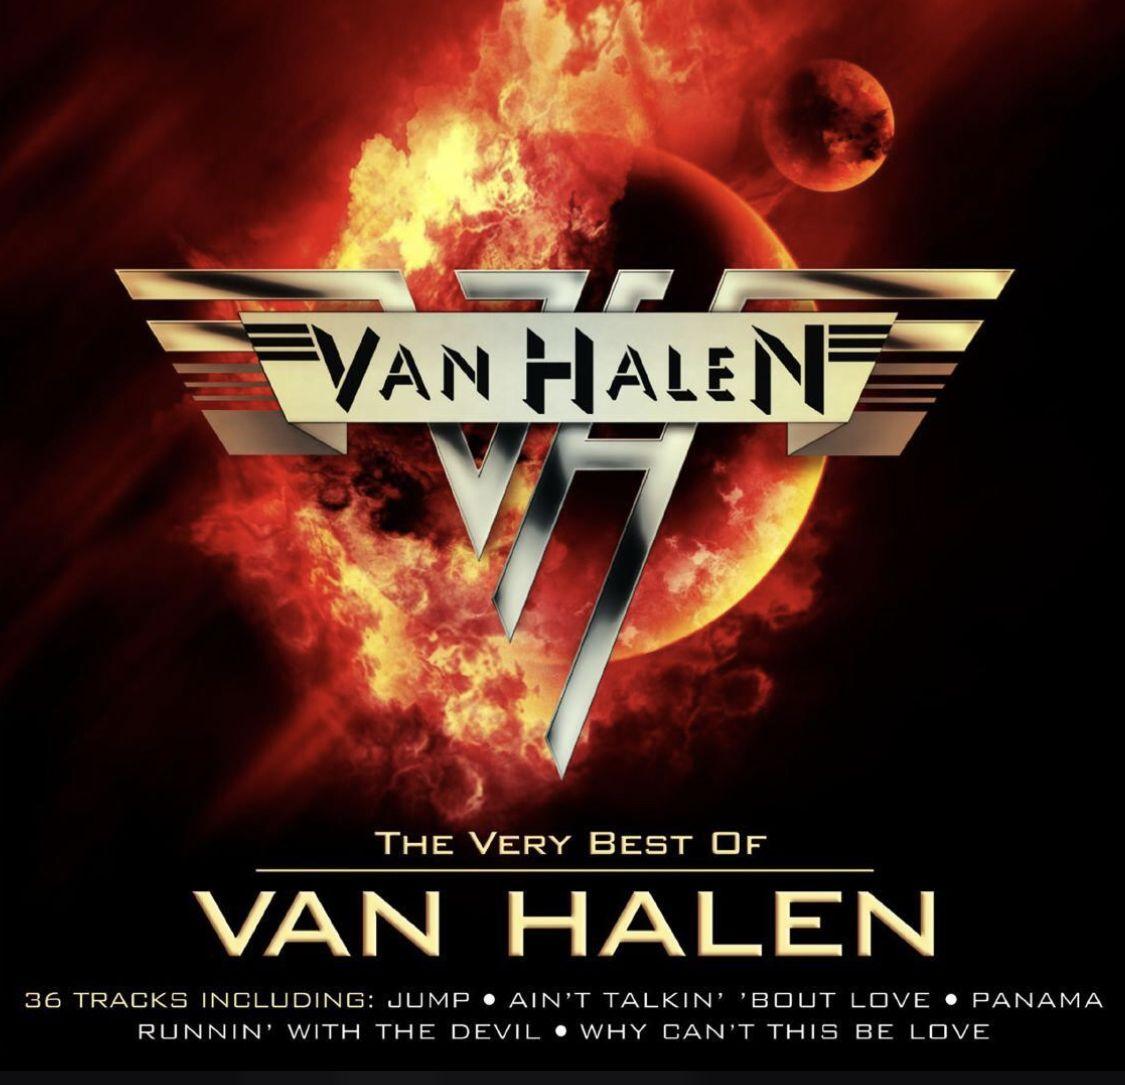 Pin By Michelle Lyons On Capas De Albuns De Rock In 2020 Van Halen Classic Rock Albums Happy Song